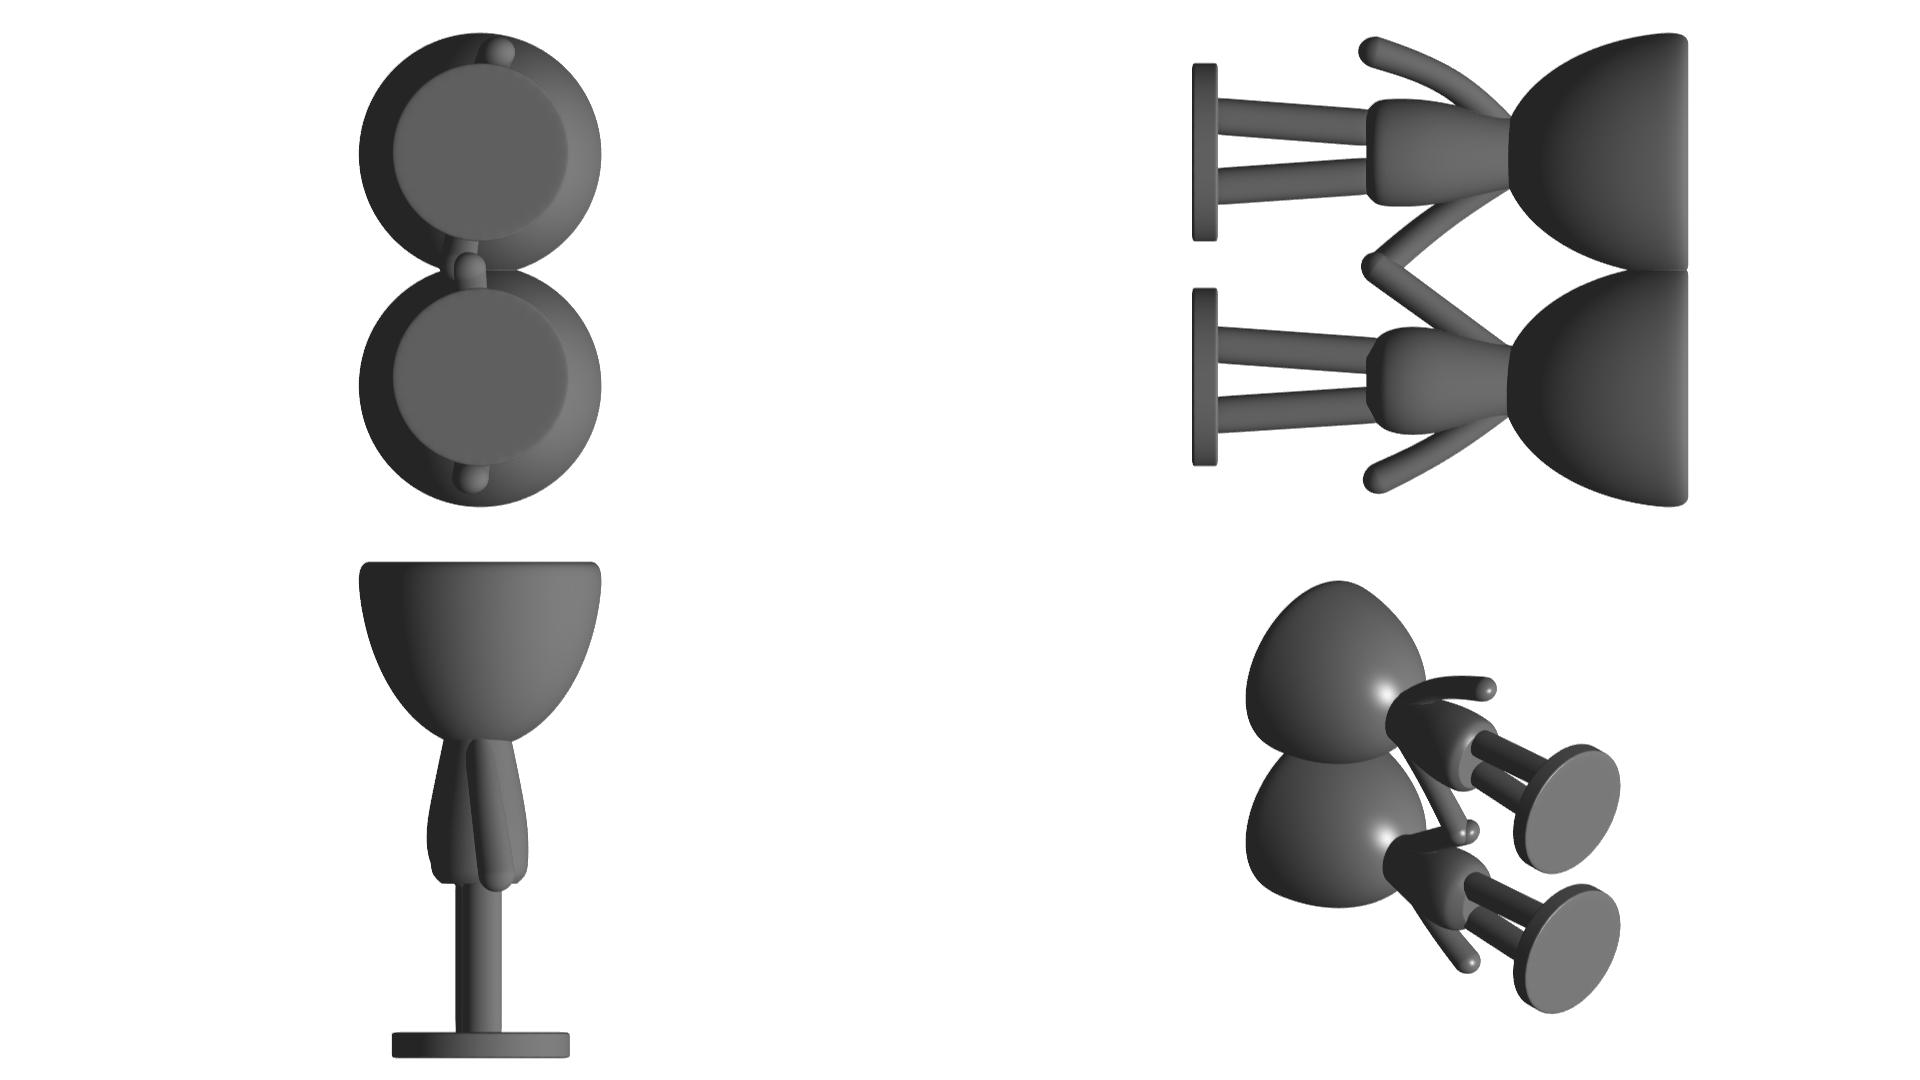 Enamorados_N6_Gris_2.png Télécharger fichier STL gratuit N° 6 VASES ROBERT IN LOVE - N° 6 VASE 8 POT DE FLEURS ROBERT IN LOVE • Design pour imprimante 3D, CREATIONSISHI